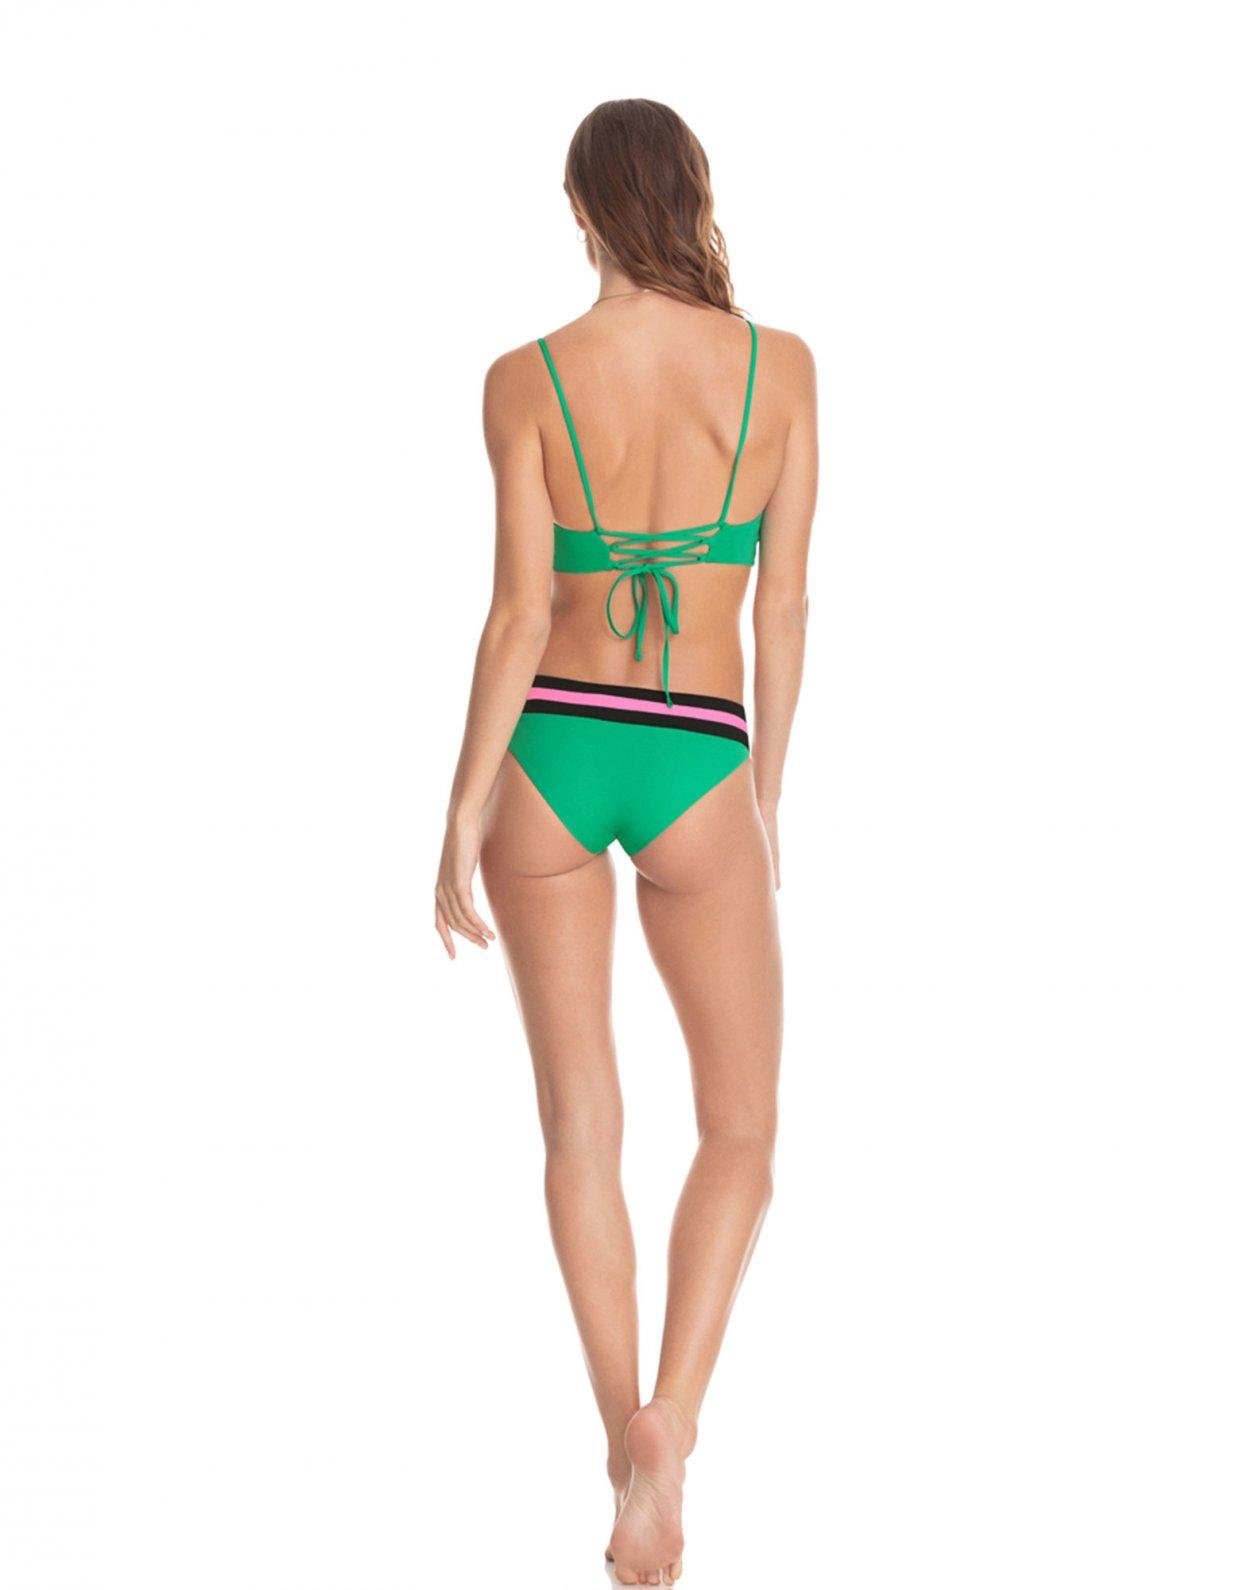 Maaji Grass green bikini